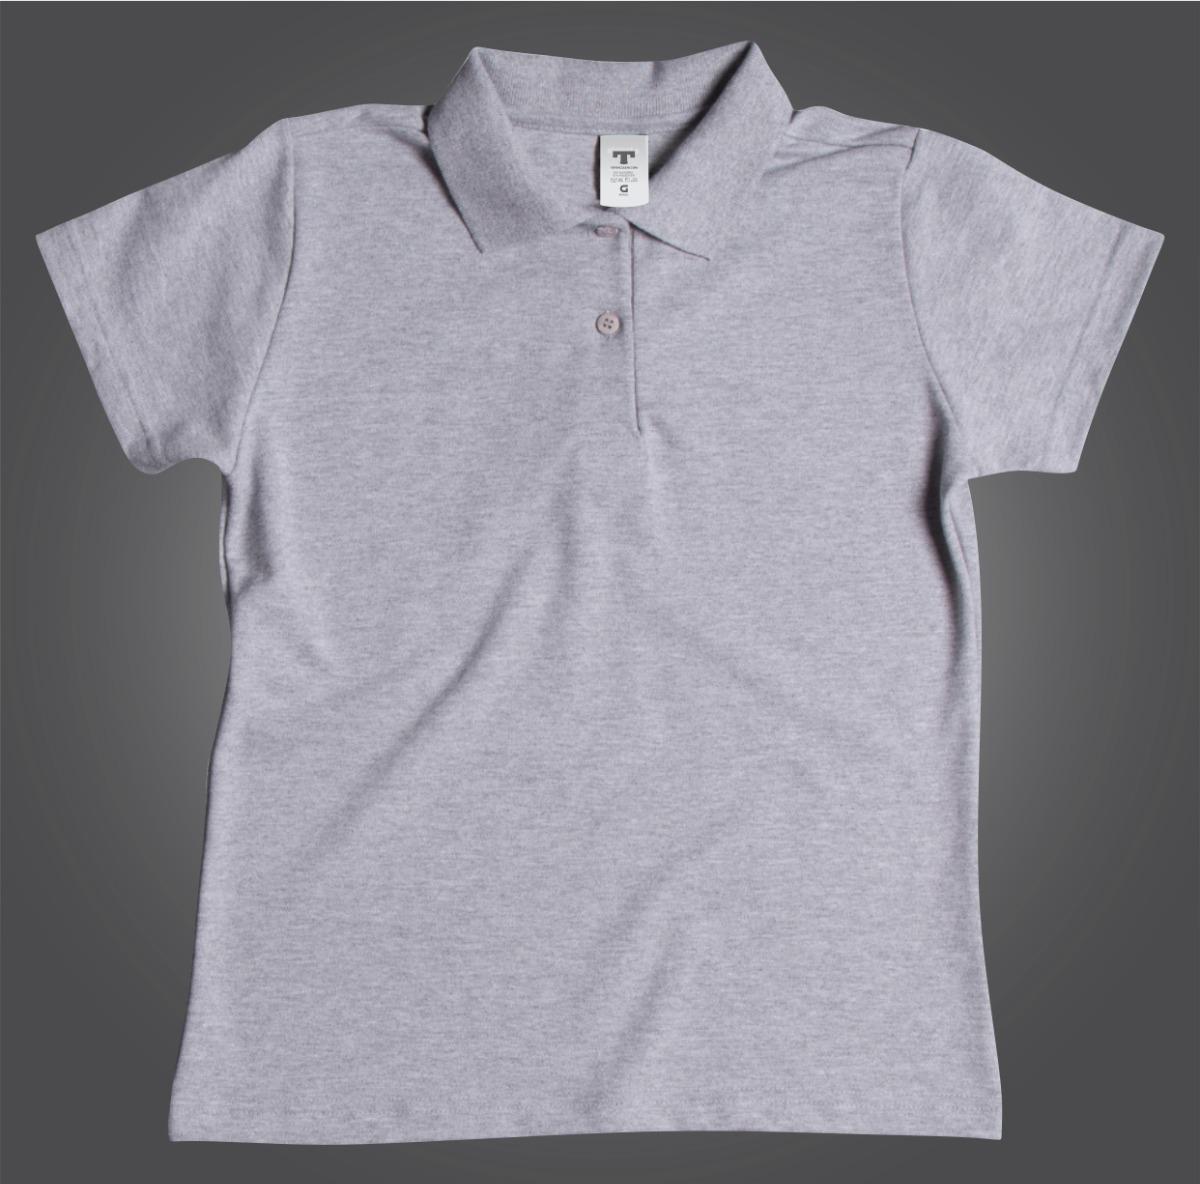 1af27dfcb7 camisa polo camiseta polo blusa polo lisa malha varias cores. Carregando  zoom.